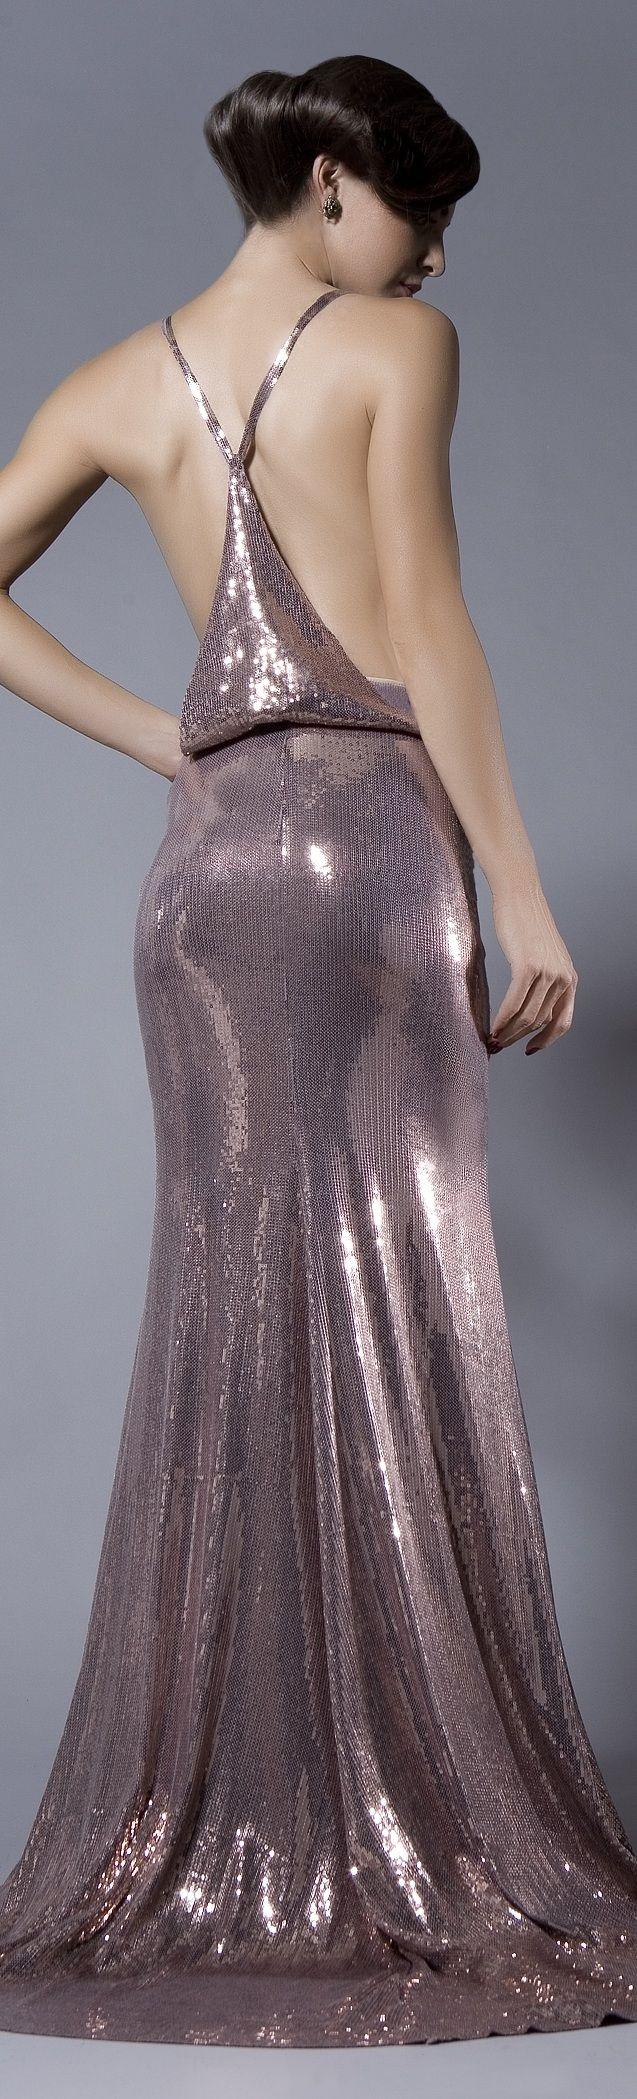 #Bien Savvy Haute Couture 2013/2014